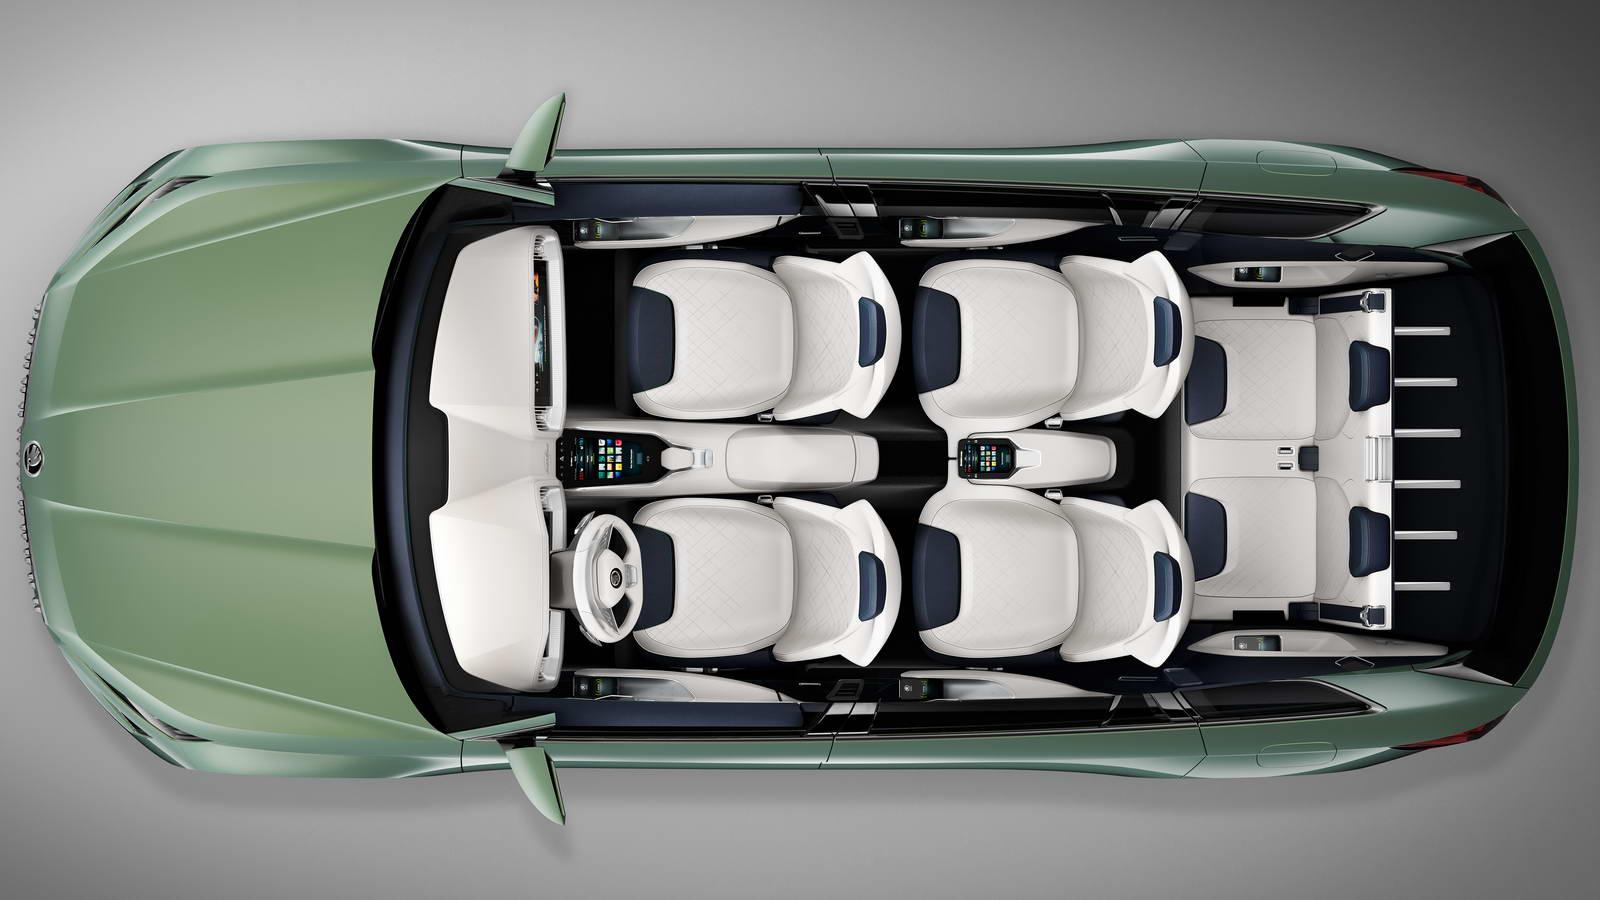 Skoda Kodiak Suv Might Get Vrs Coupe Versions Carscoops Com